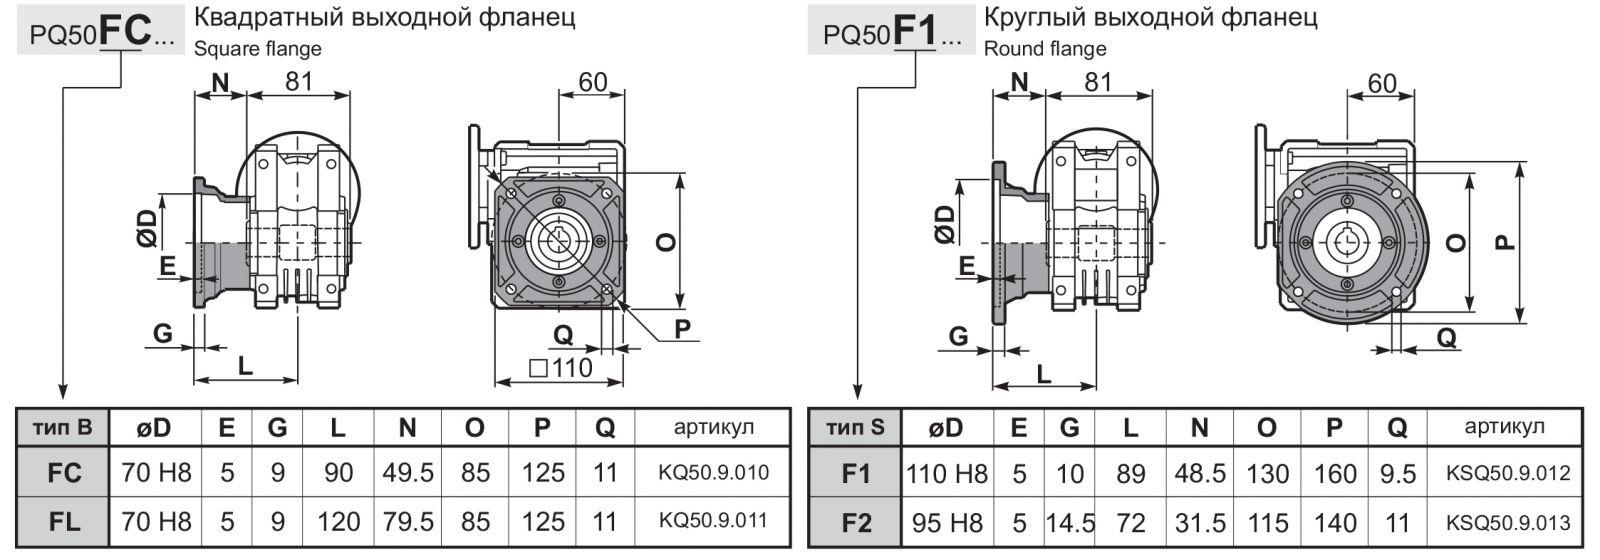 Чертеж редуктора Q 50 hydro-mec фланцы